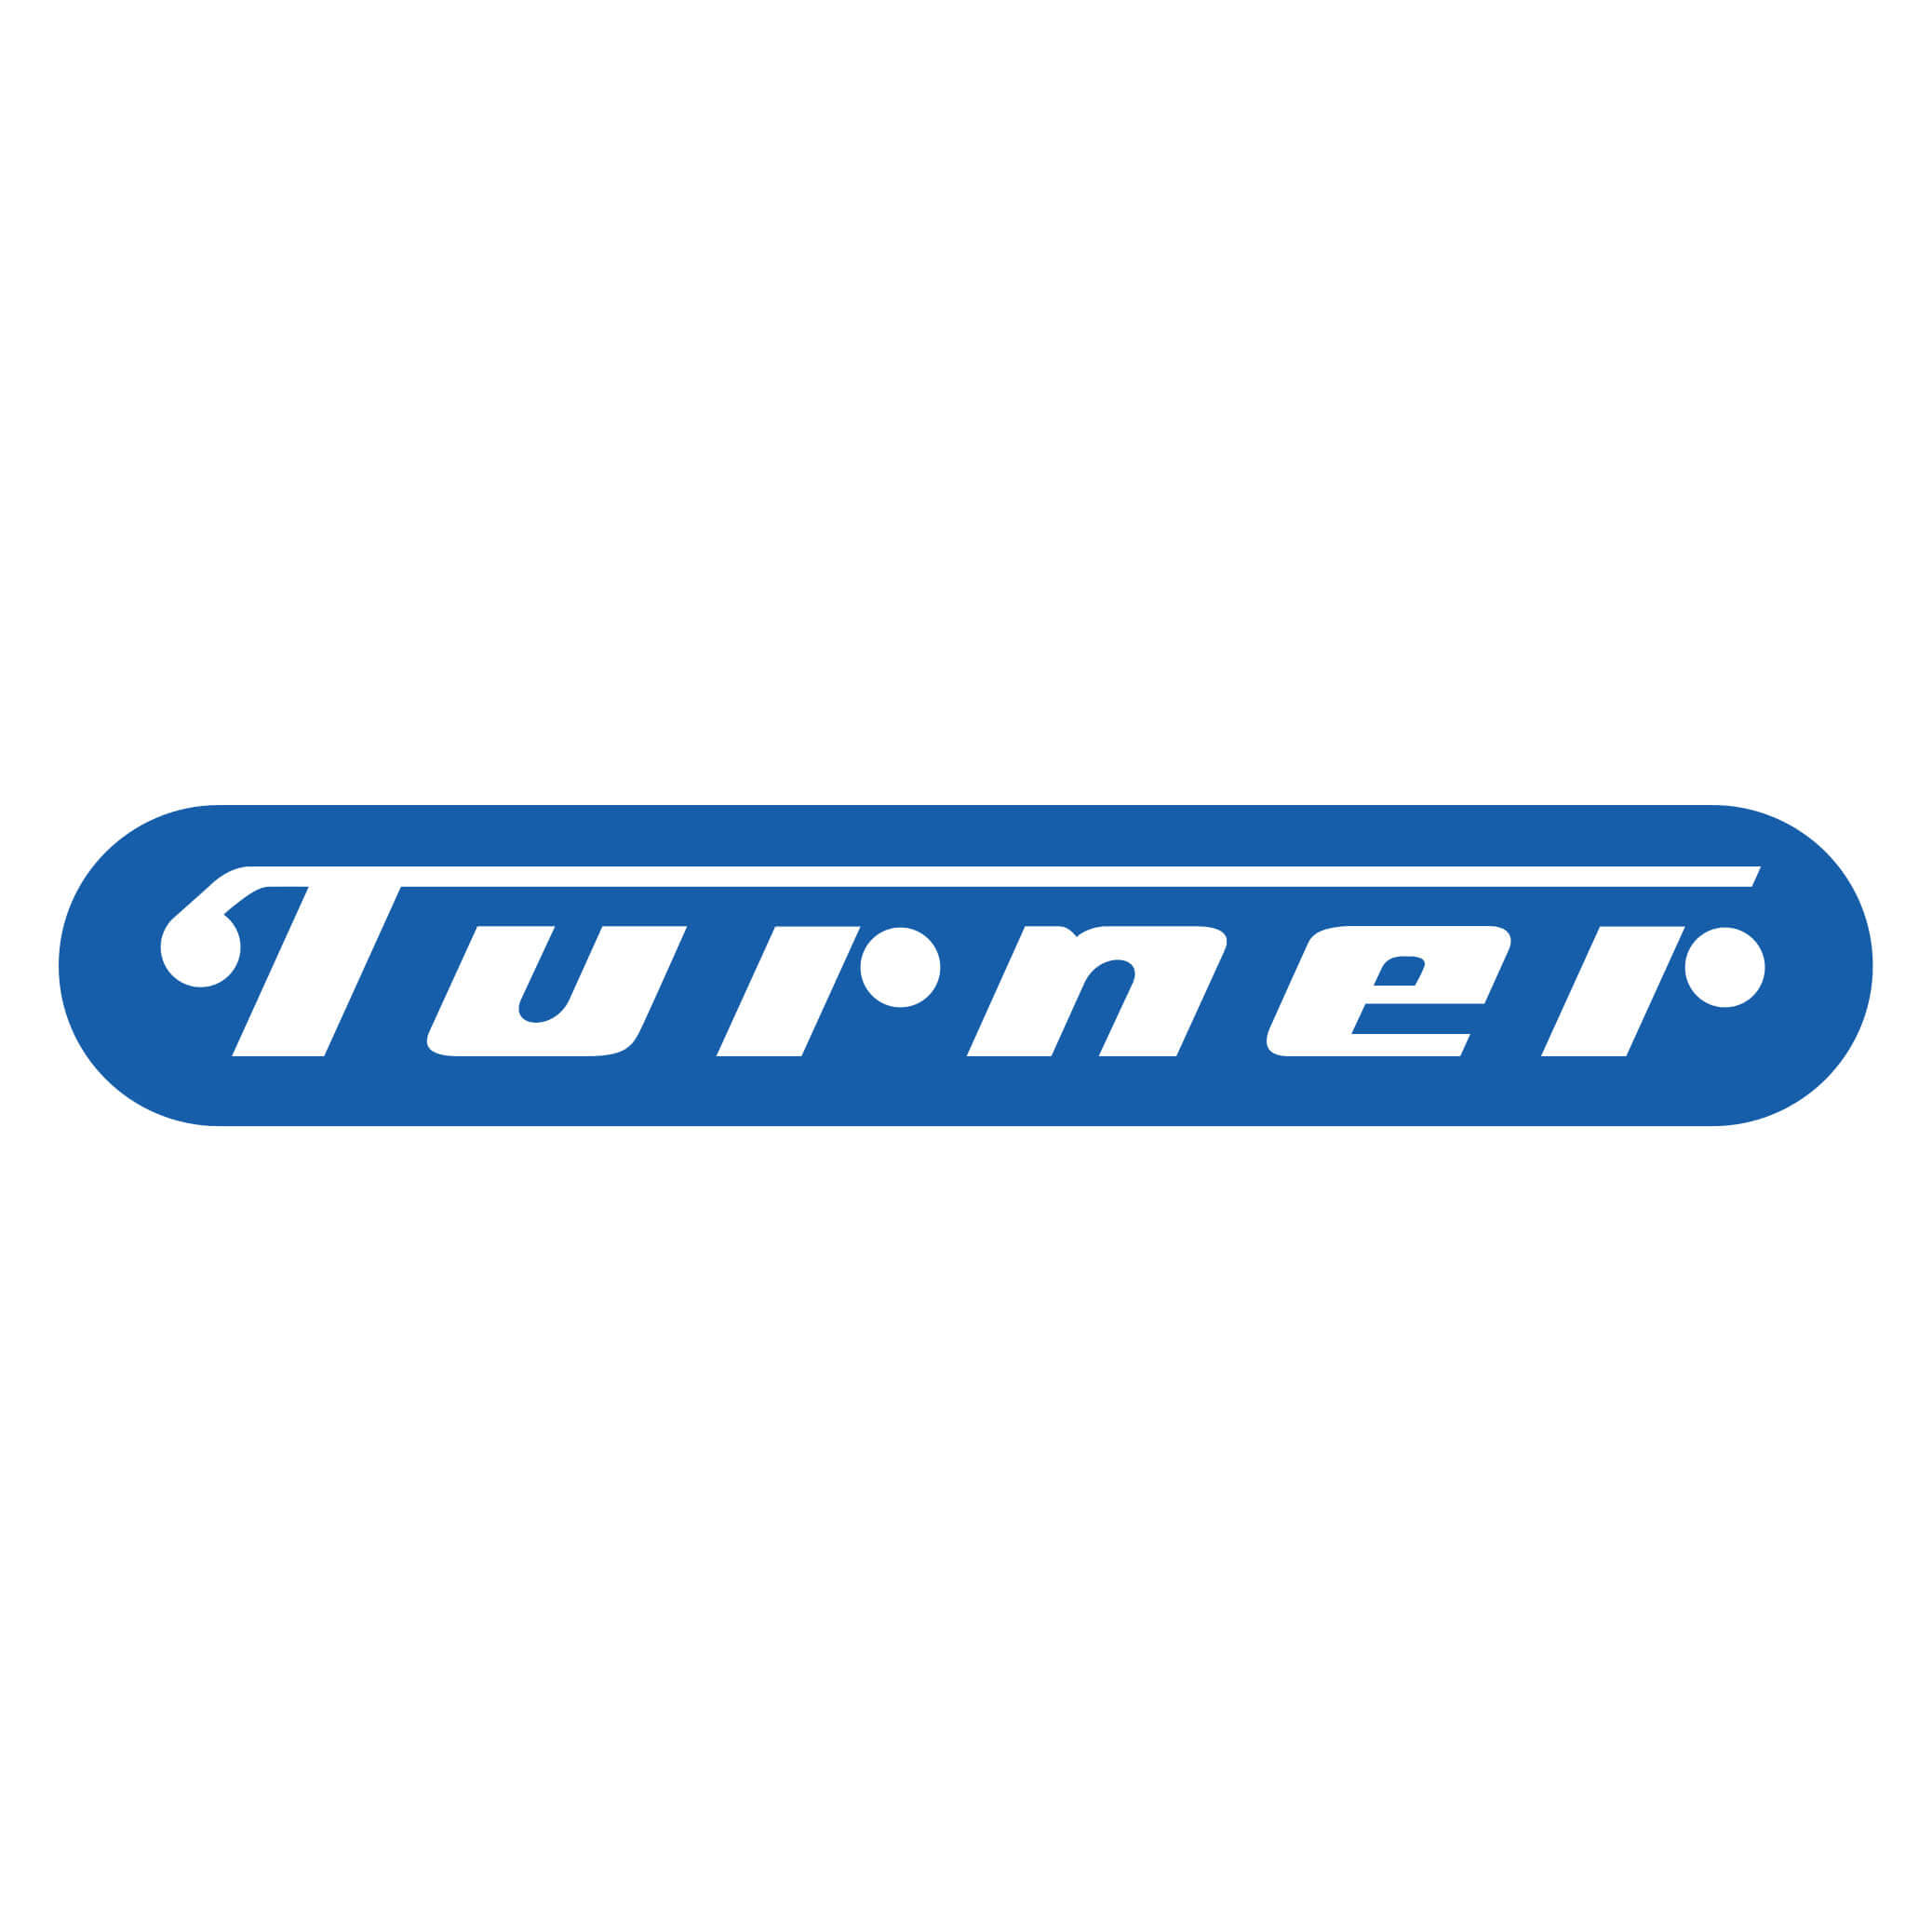 Turner_200x.jpg